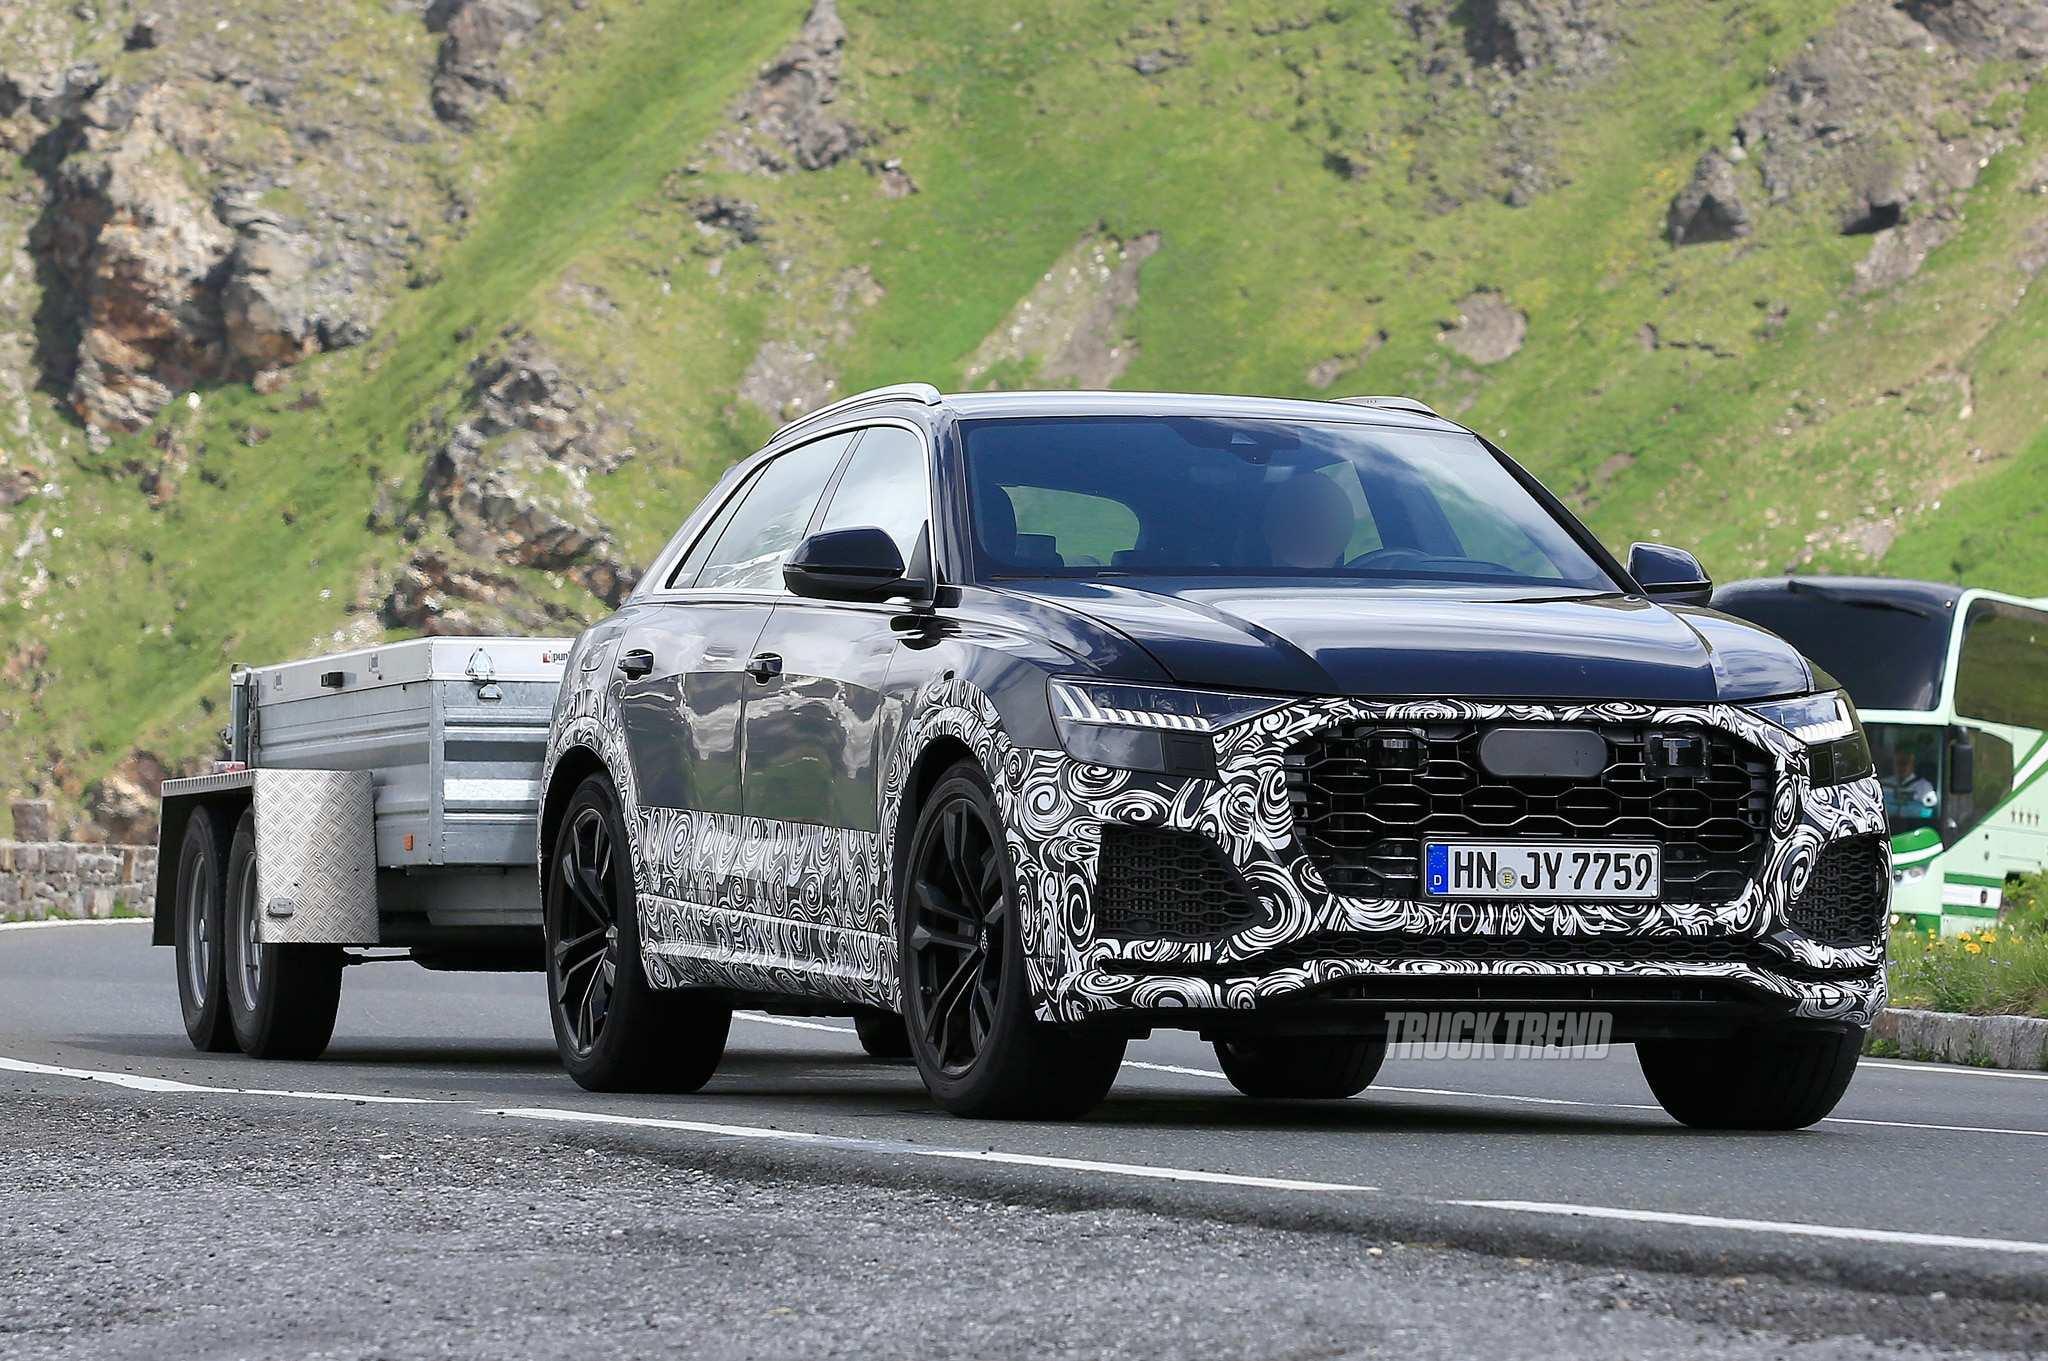 27 New Audi Truck 2020 Reviews for Audi Truck 2020